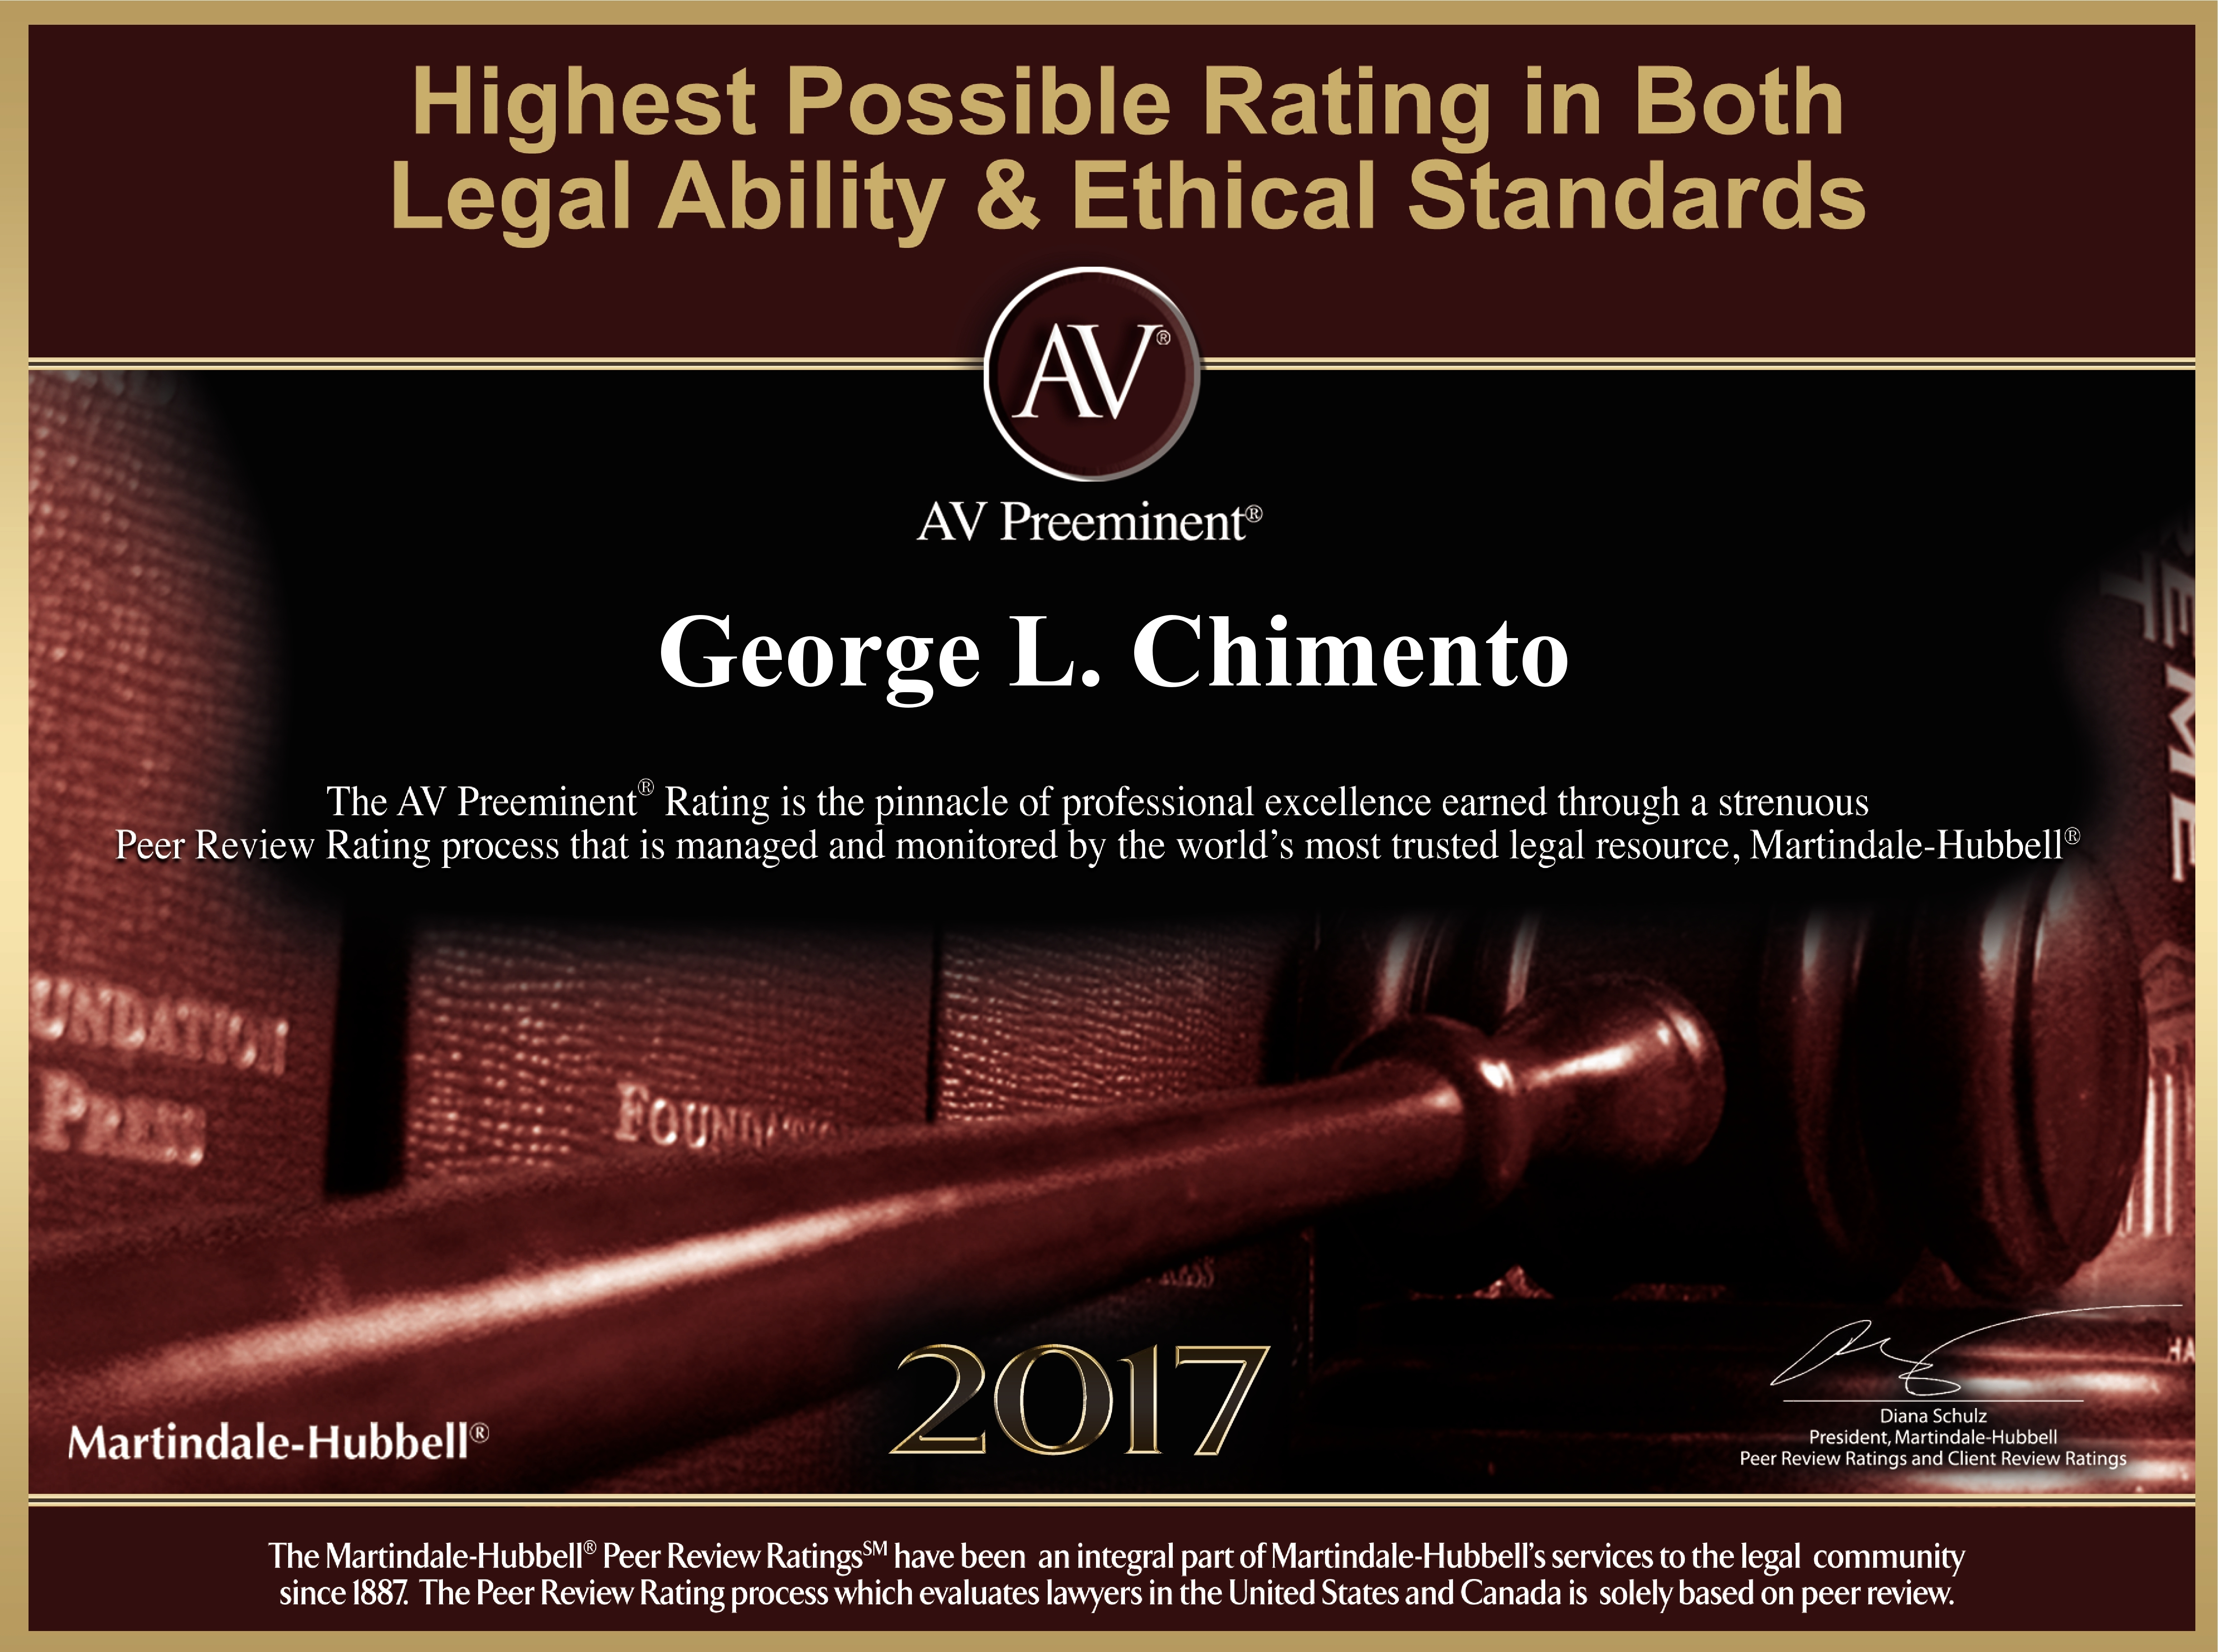 George L. Chimento, AV Preeminent